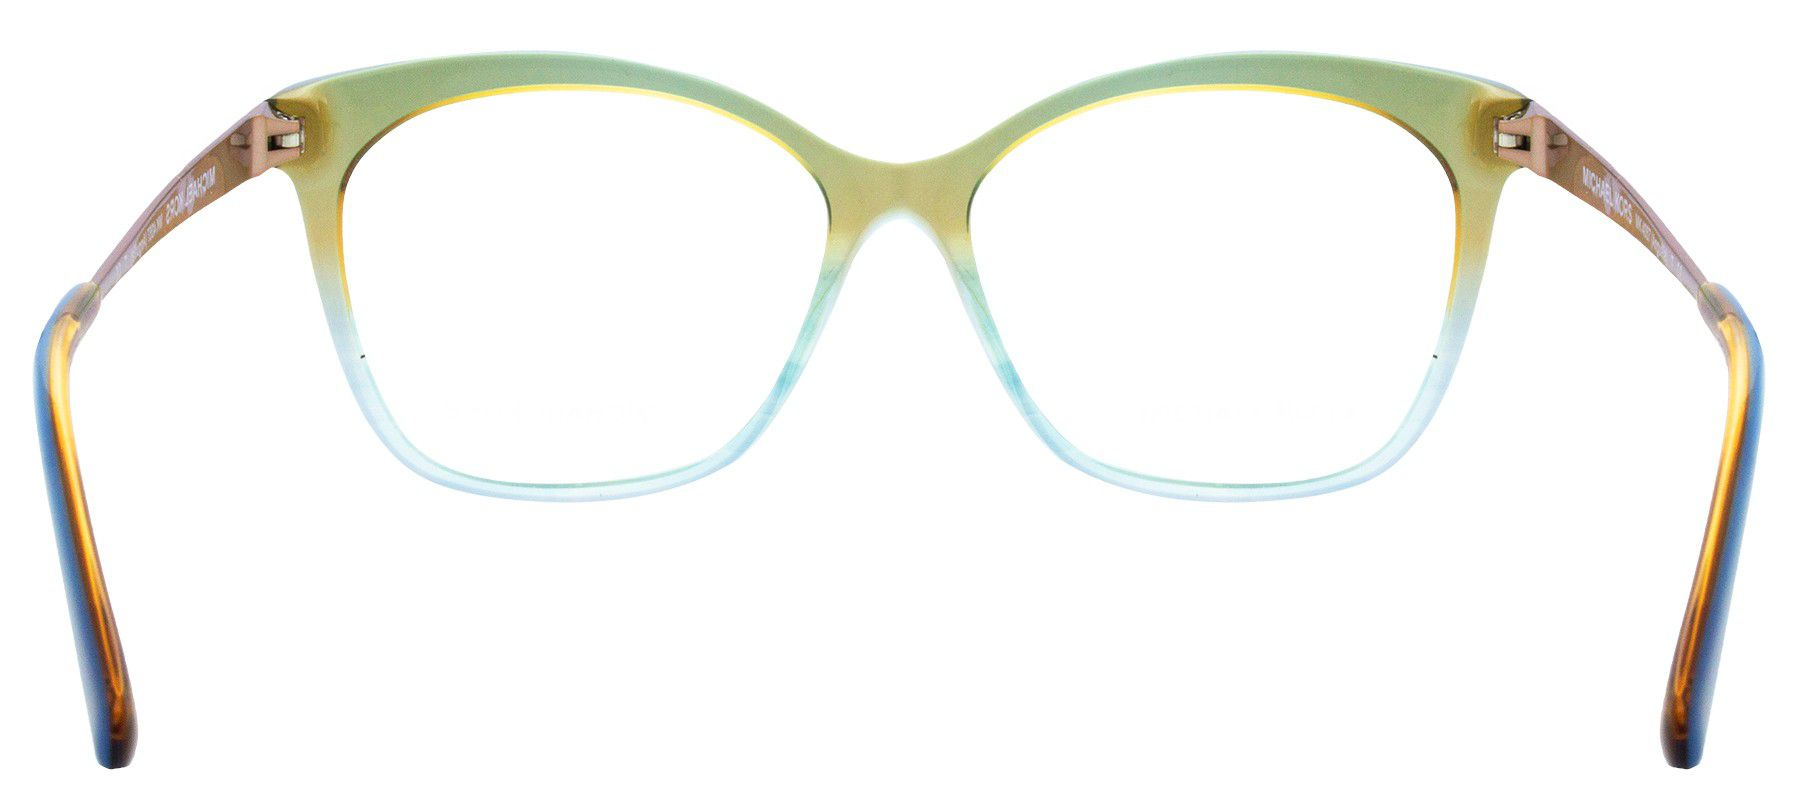 c3c6b7f8a26d8 Armação Óculos de Grau Michael Kors MK4057 Anguilla - Omega Ótica e ...